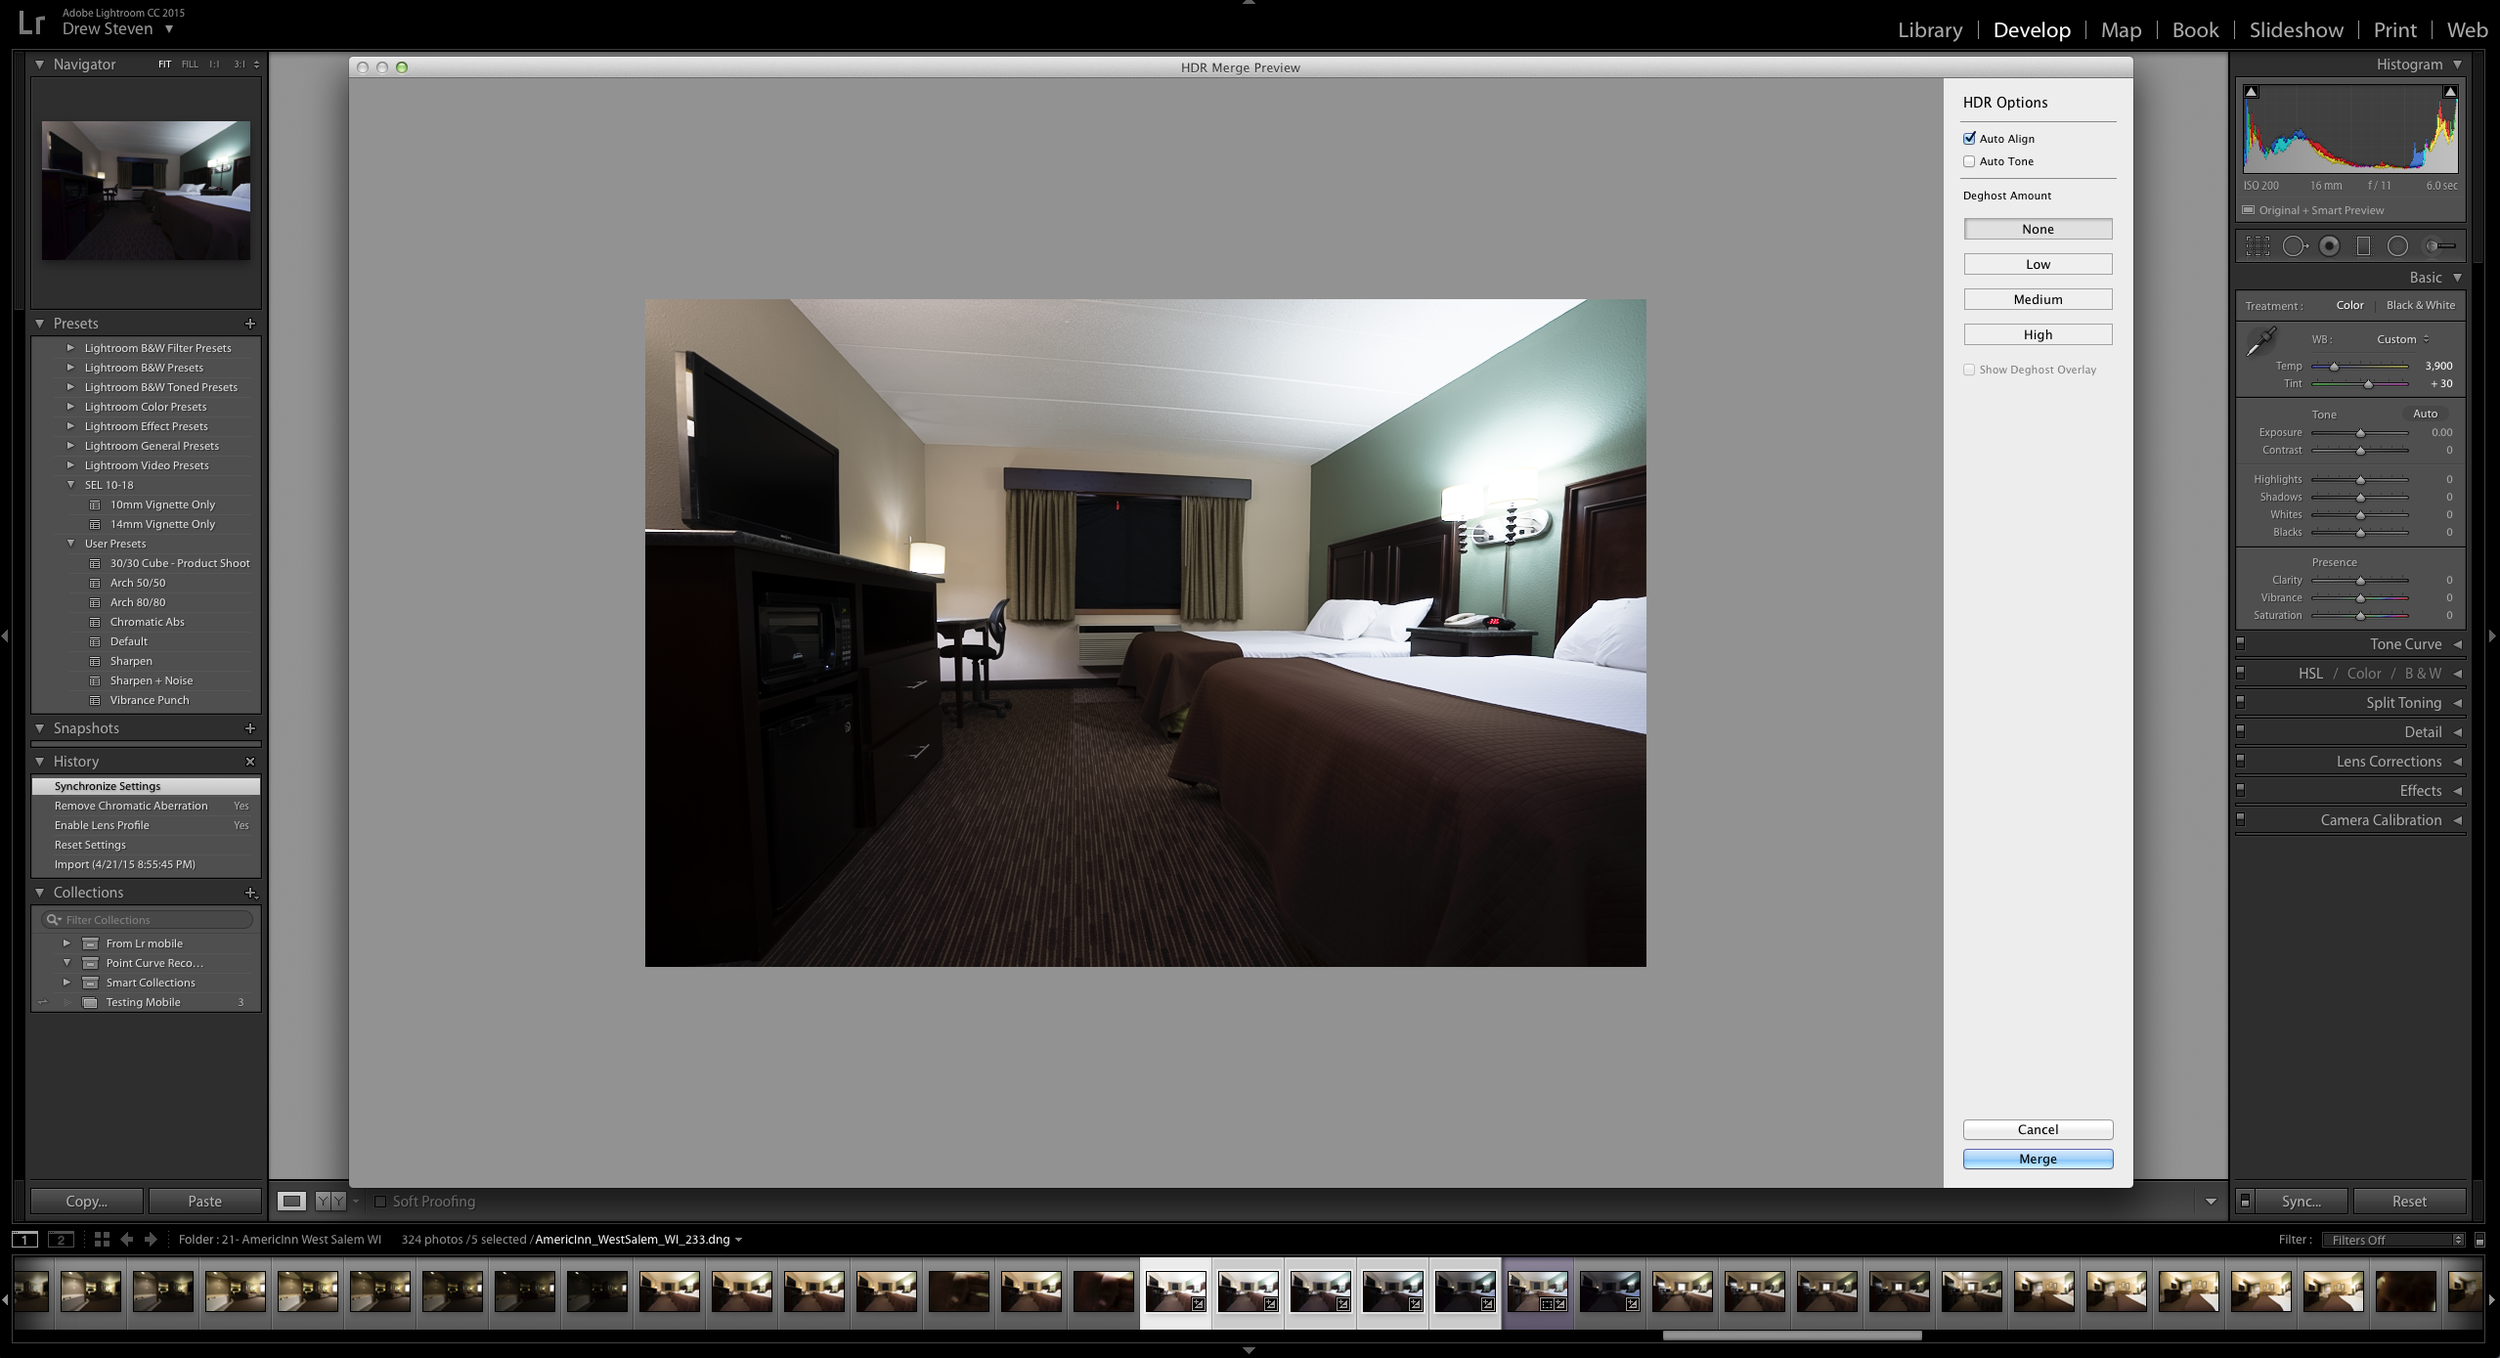 Lightroom CC 6 Adobe Photoshop Photomerge New HDR DNG Non Destructive 32 Bit Float